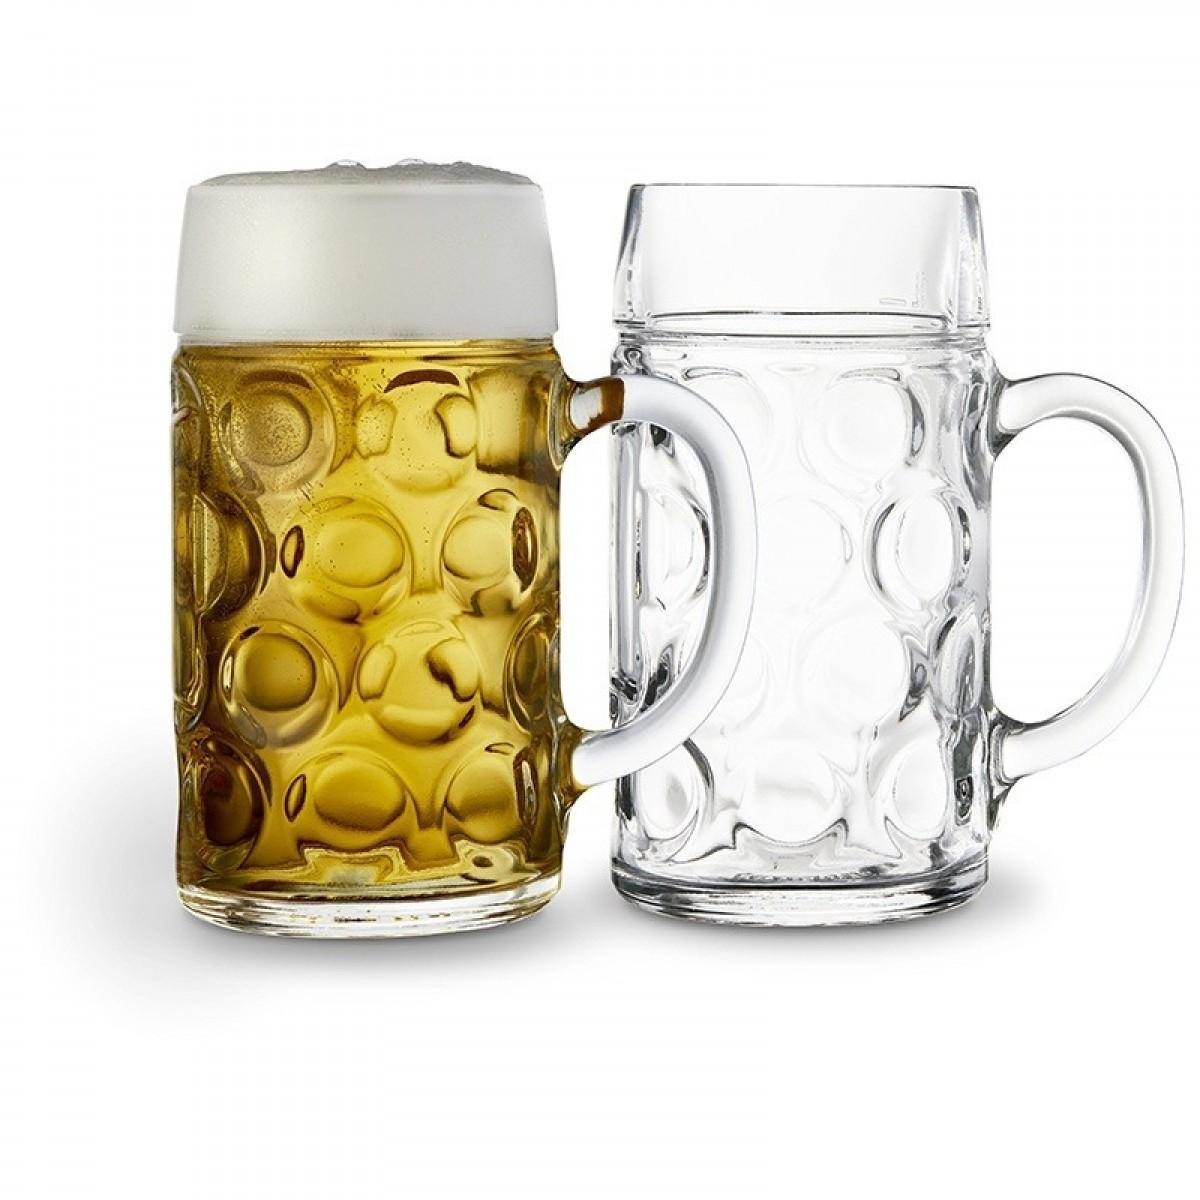 LYNGBY Glas ølkrus 1 ltr. 2 stk